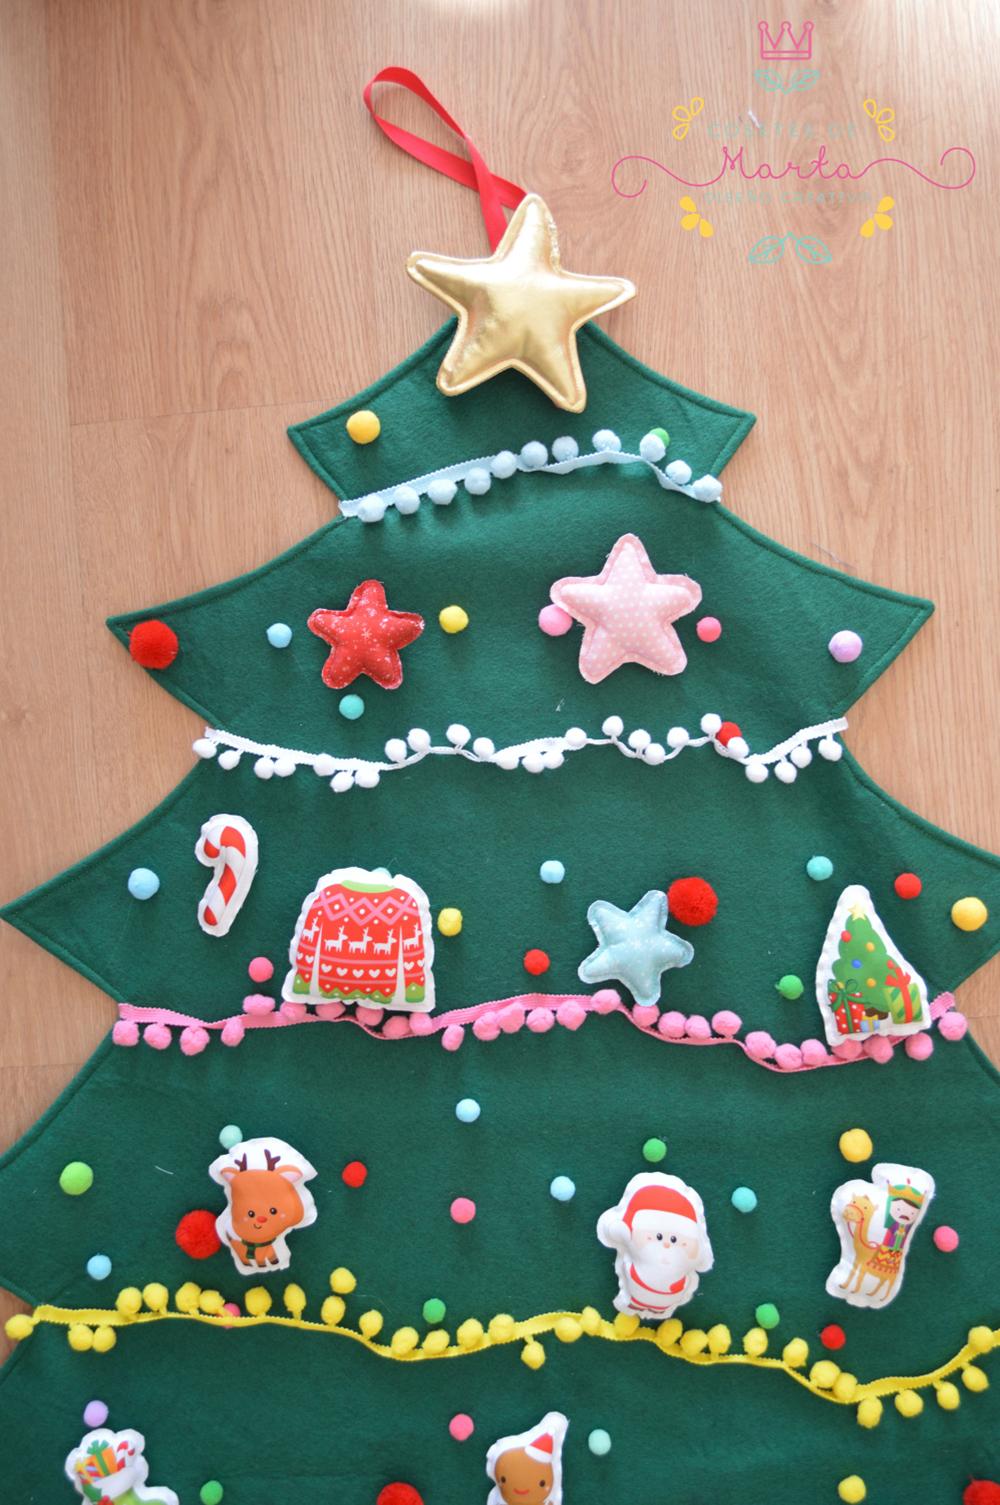 Navidad Navidad dulce Navidad!